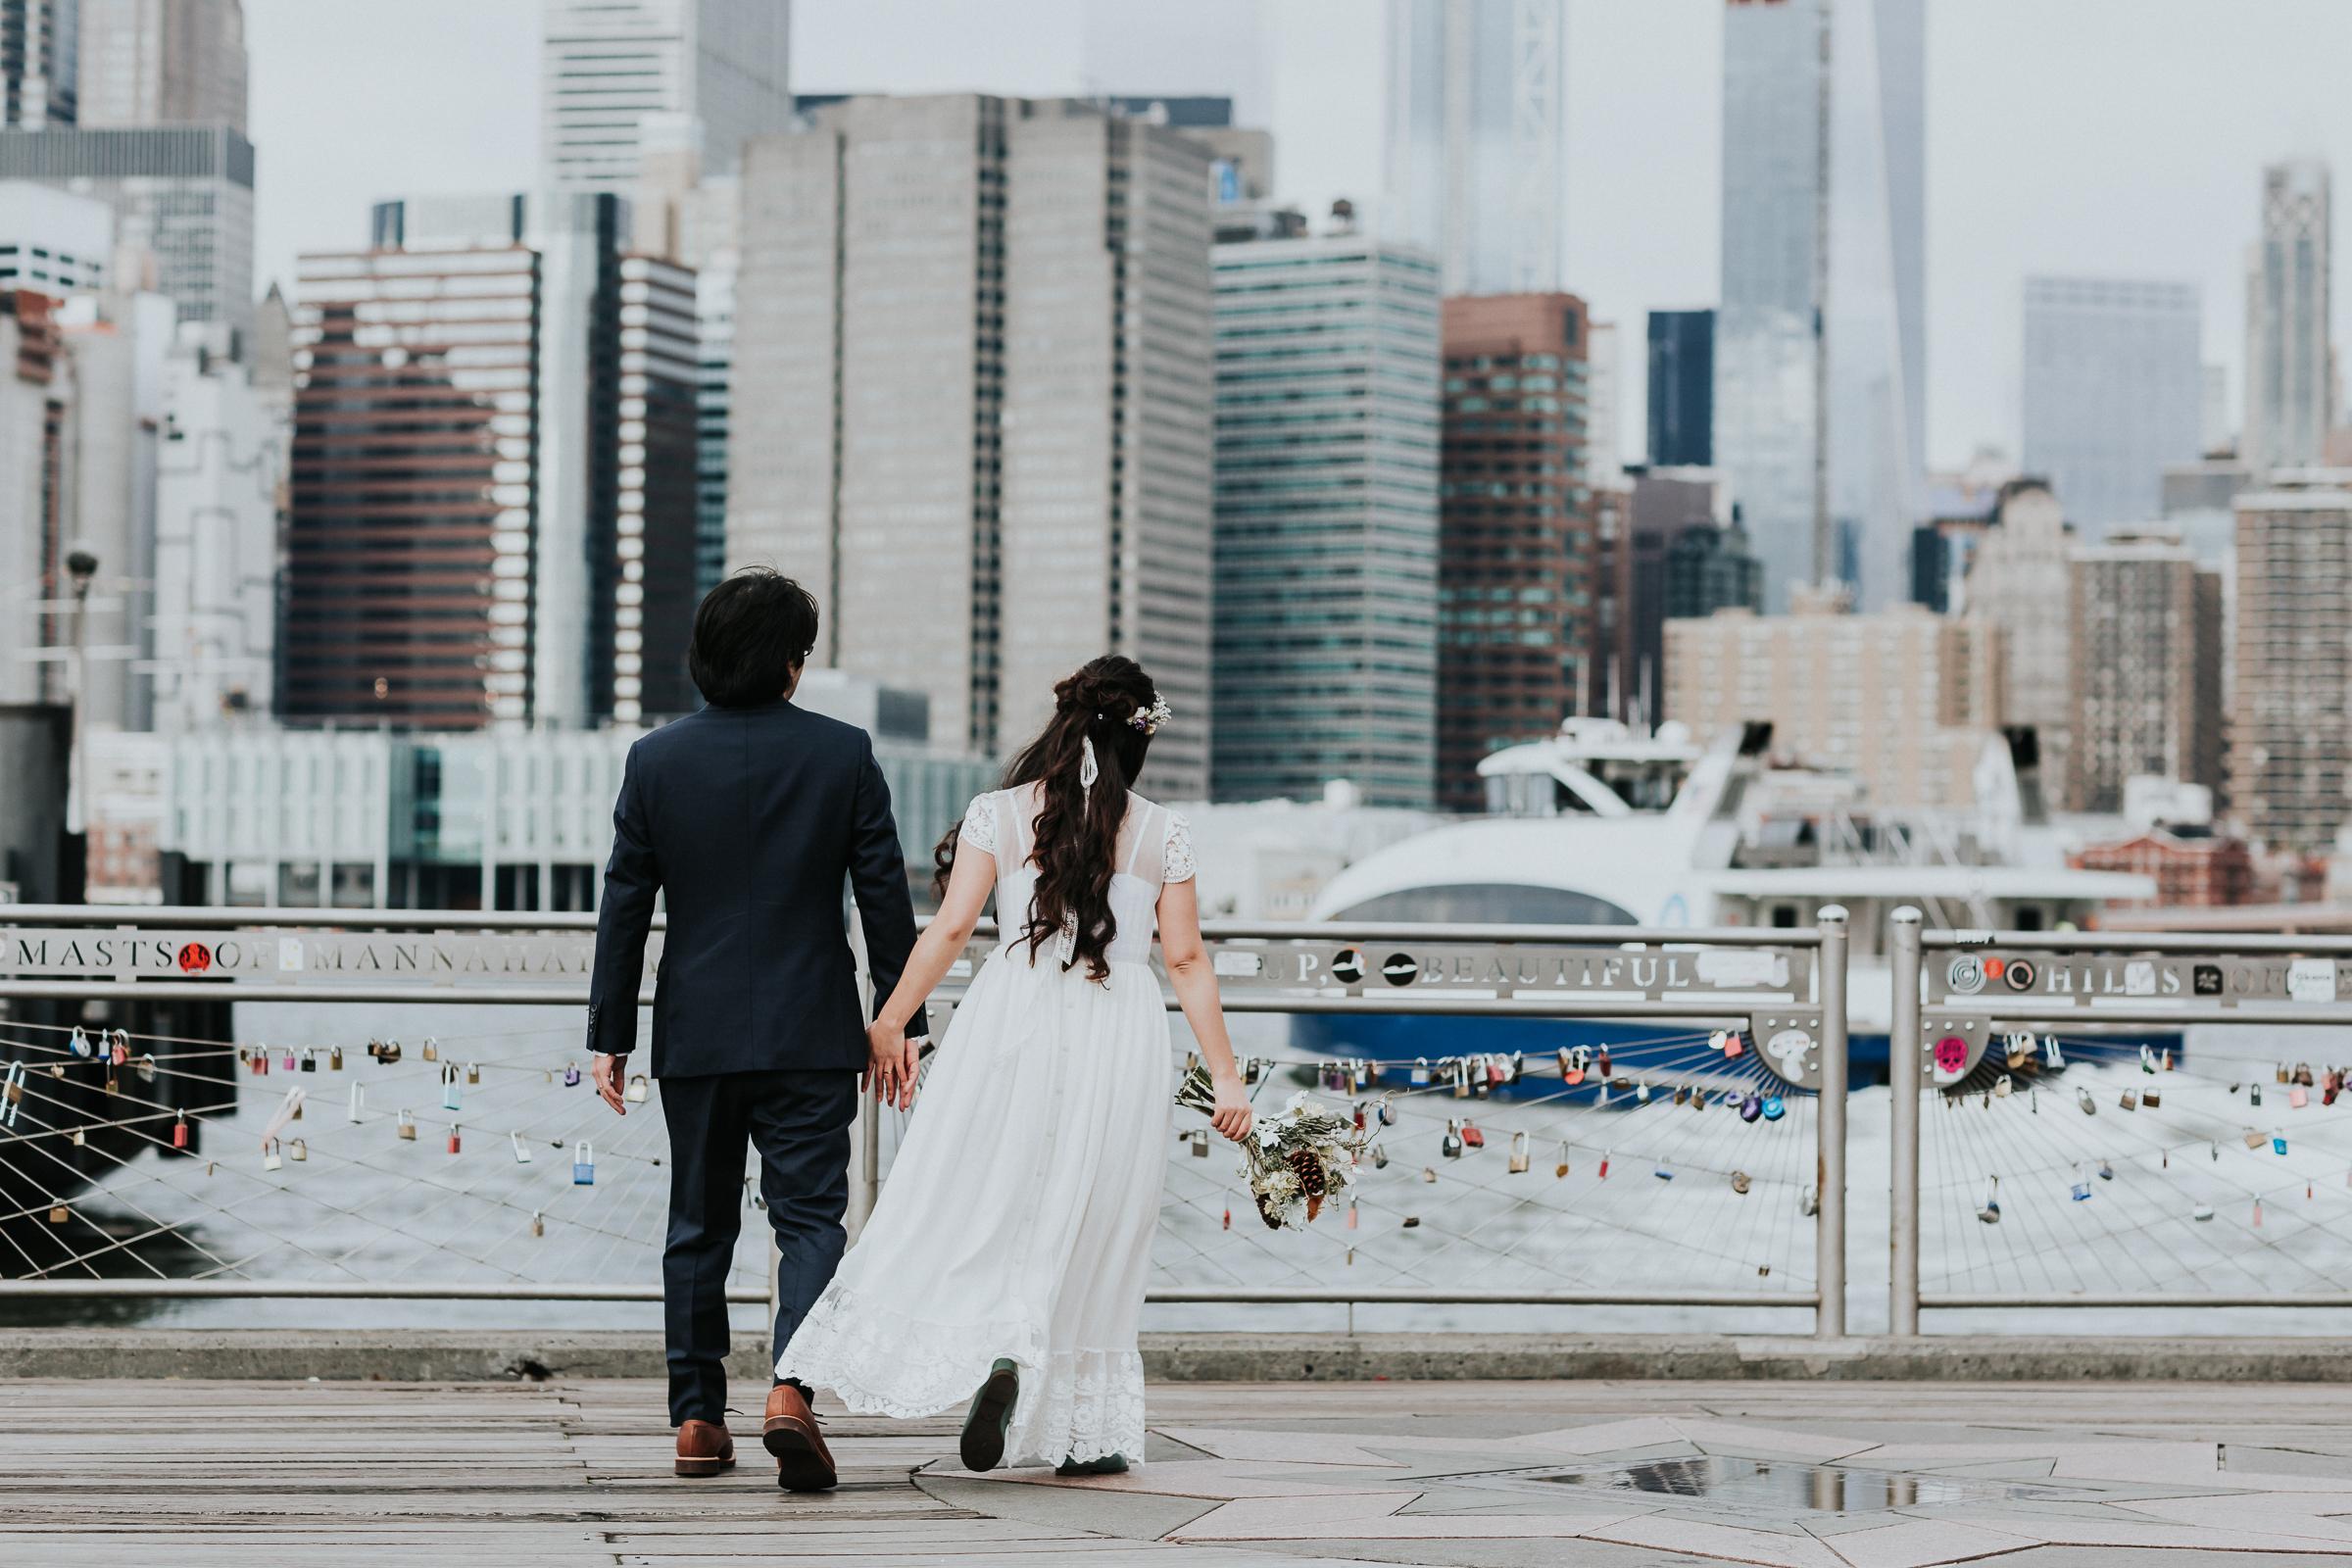 Central-Park-Brooklyn-Bridge-Dumbo-NYC-Documentary-Wedding-Photographer-20.jpg